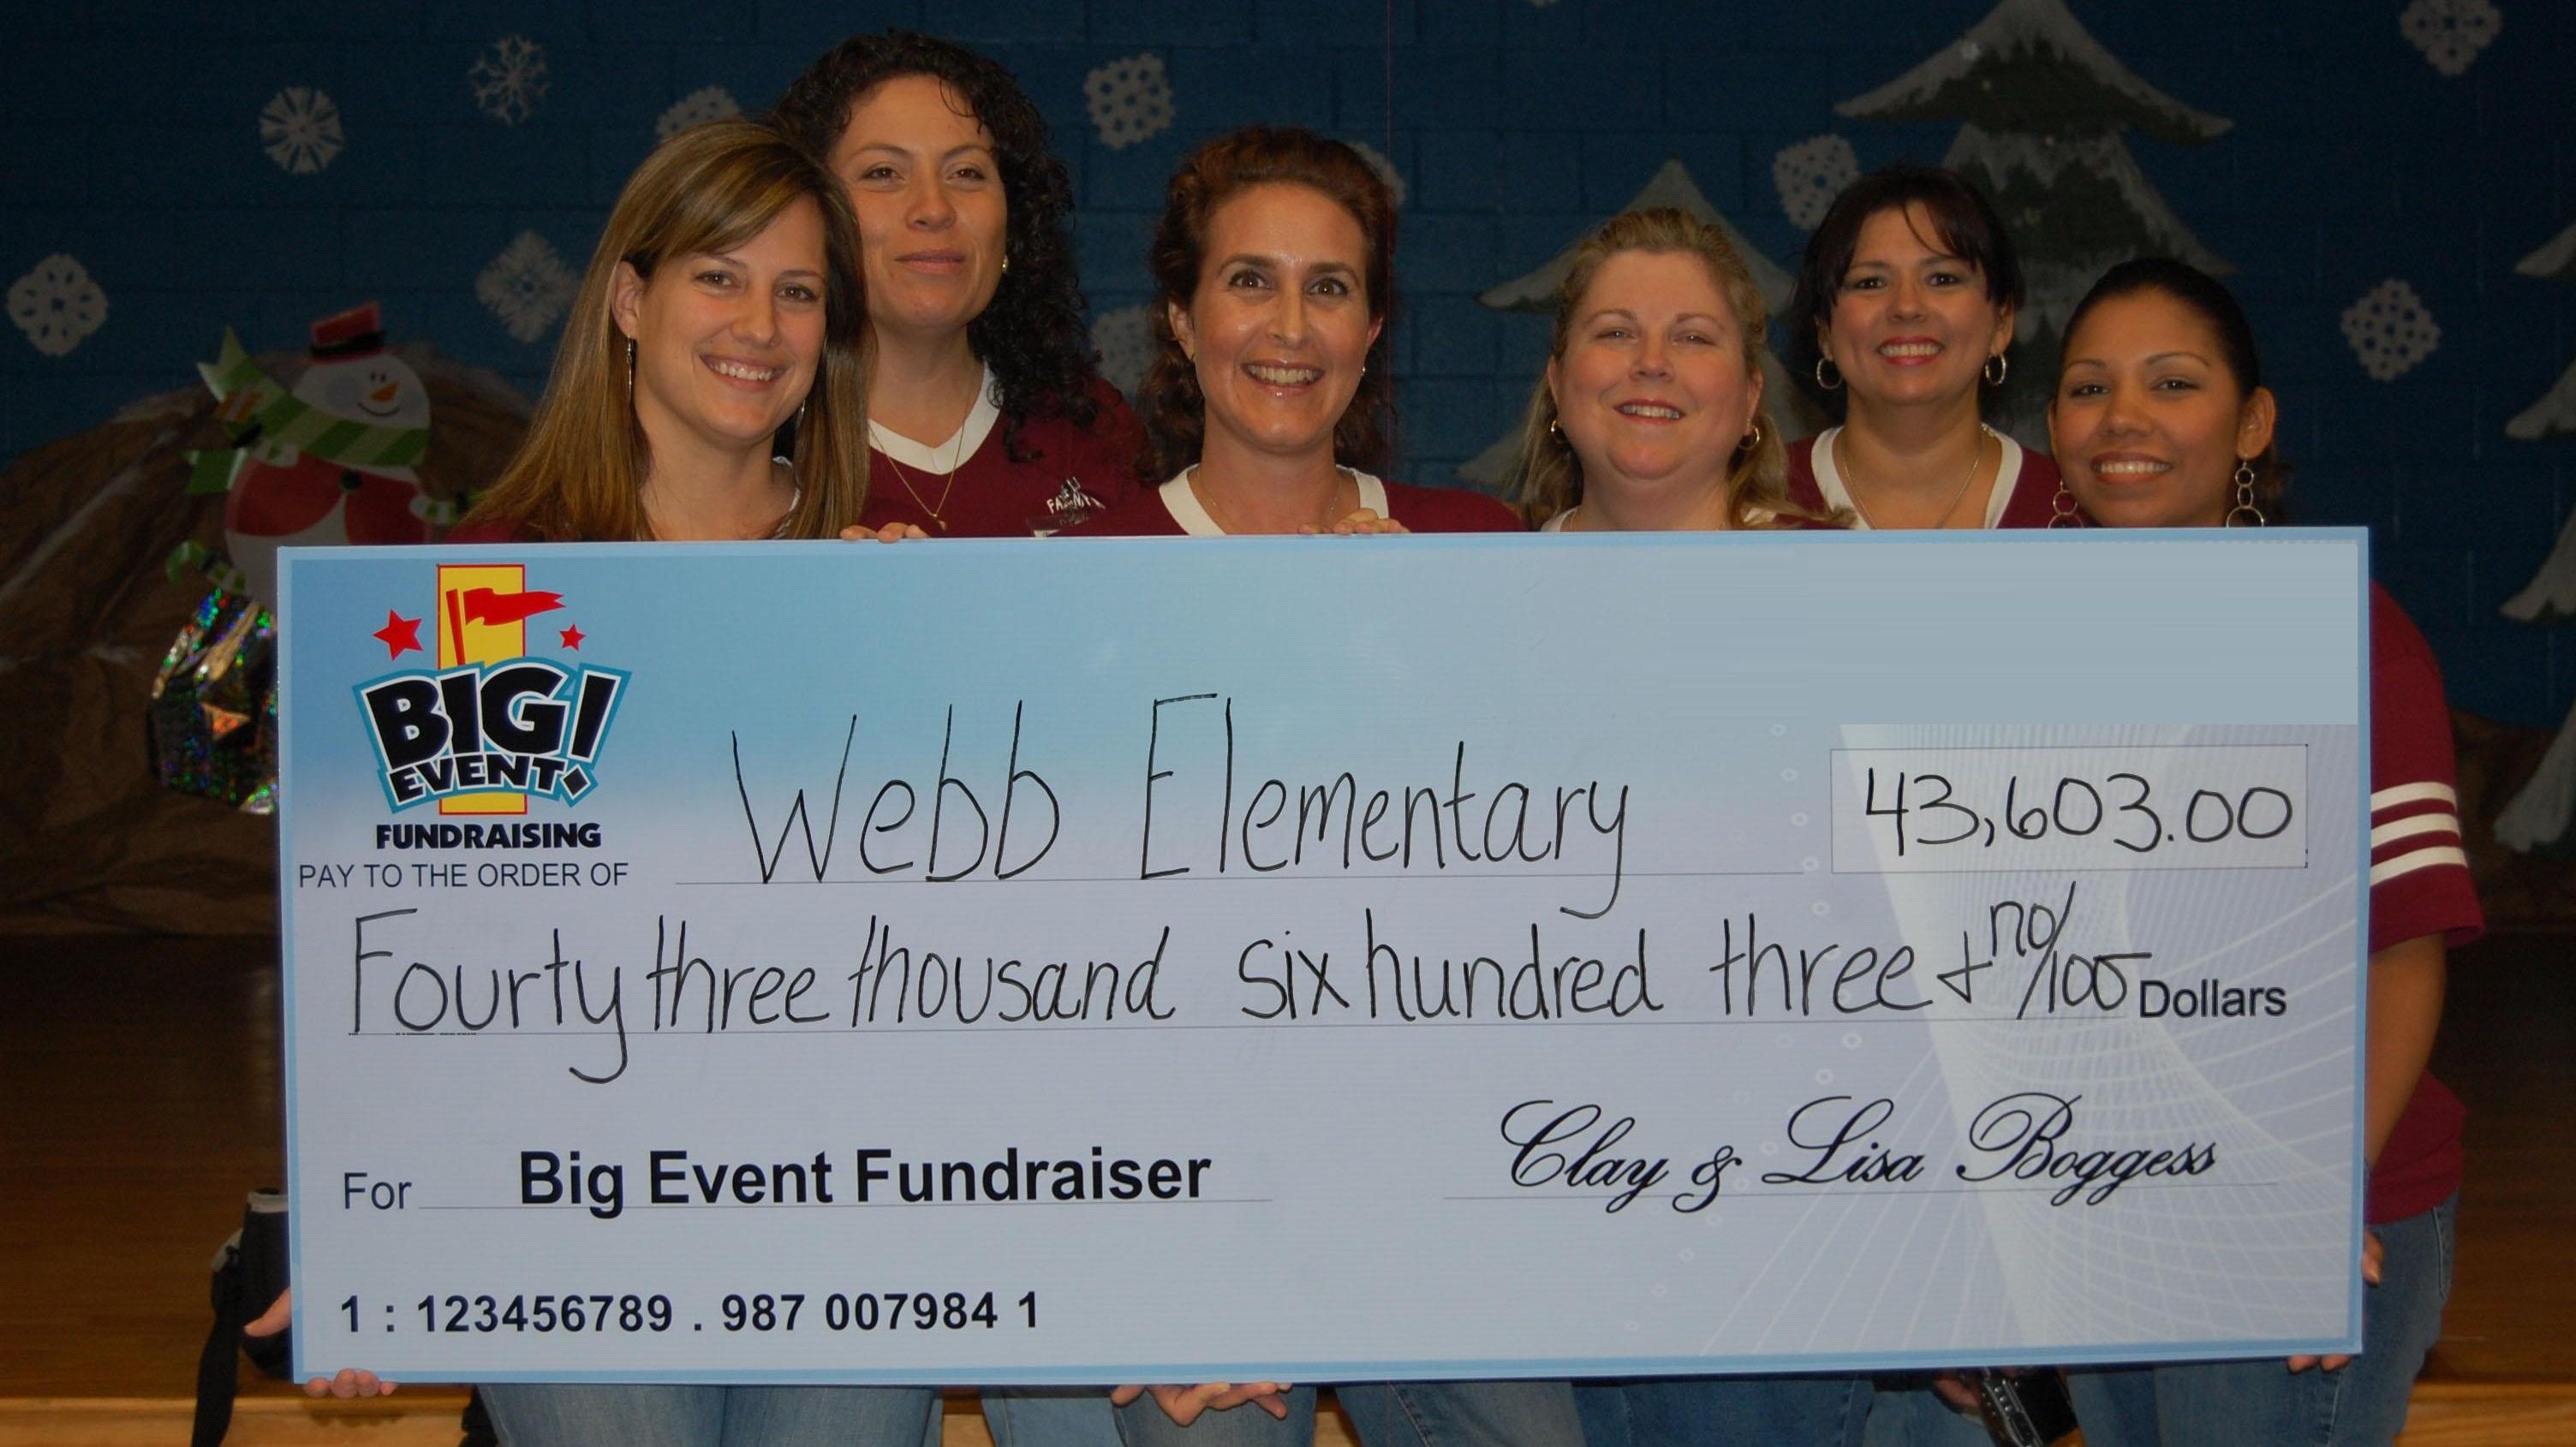 Webb Elementary School fundraising team holding check